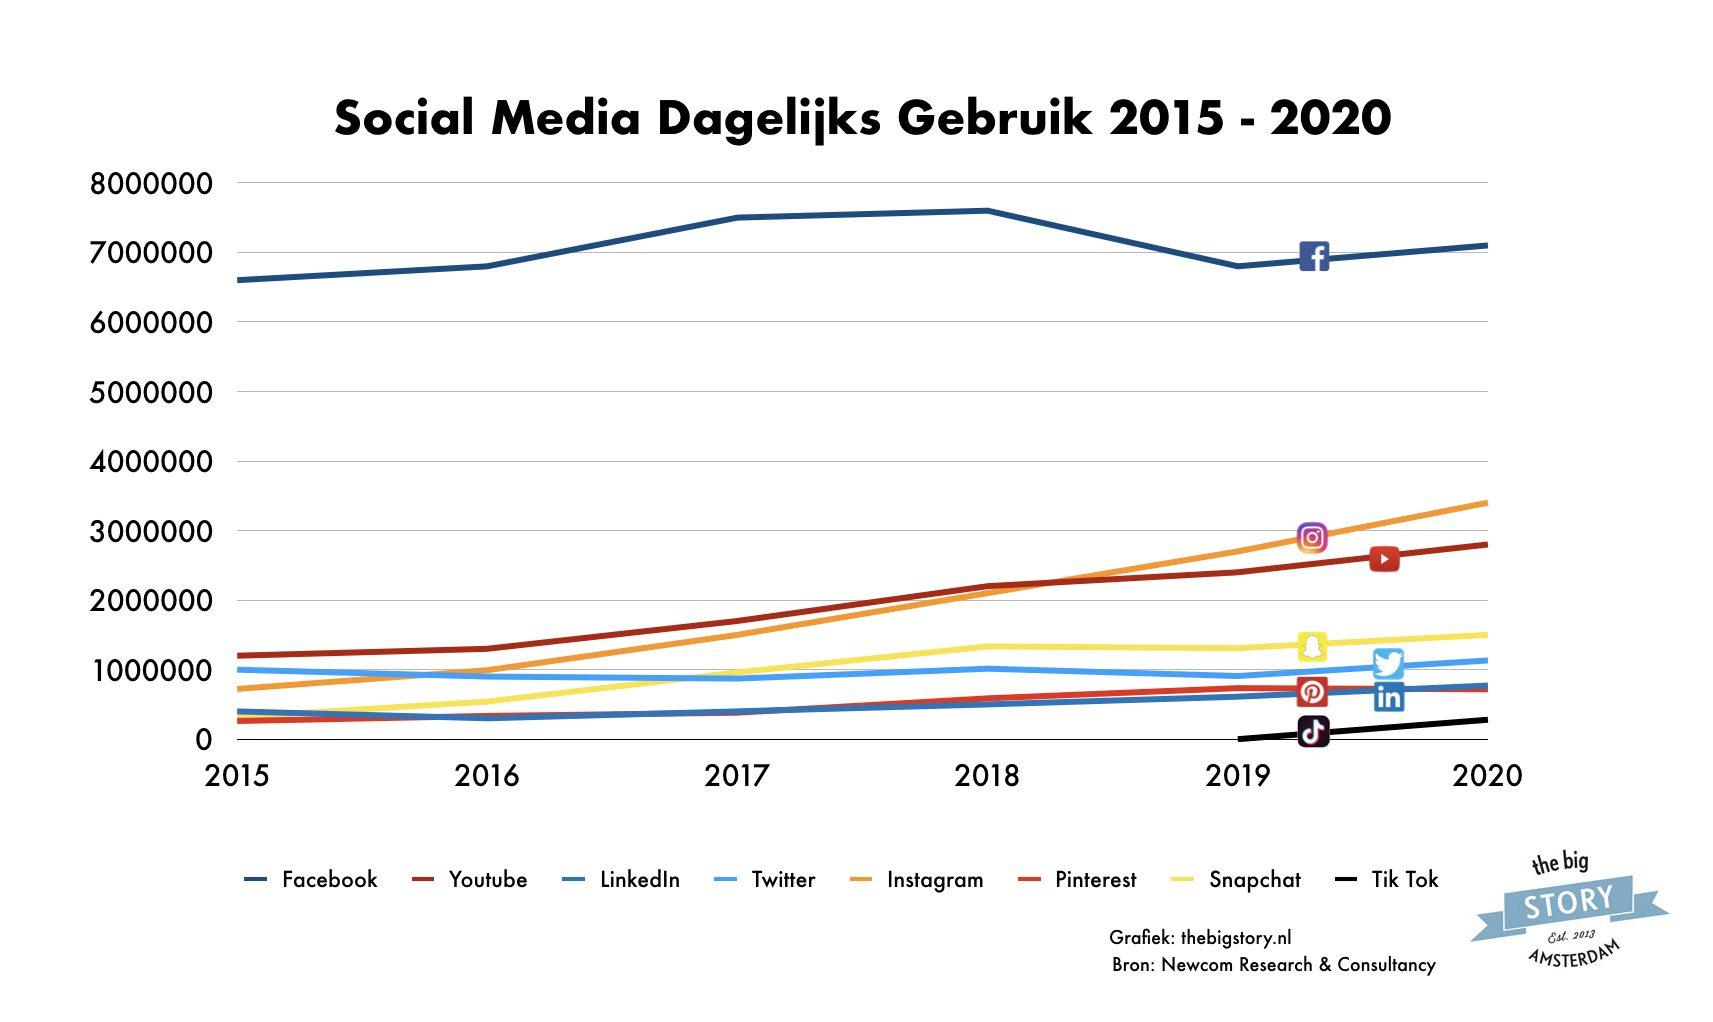 Dagelijks gebruik social media in Nederland 2015 - 2020